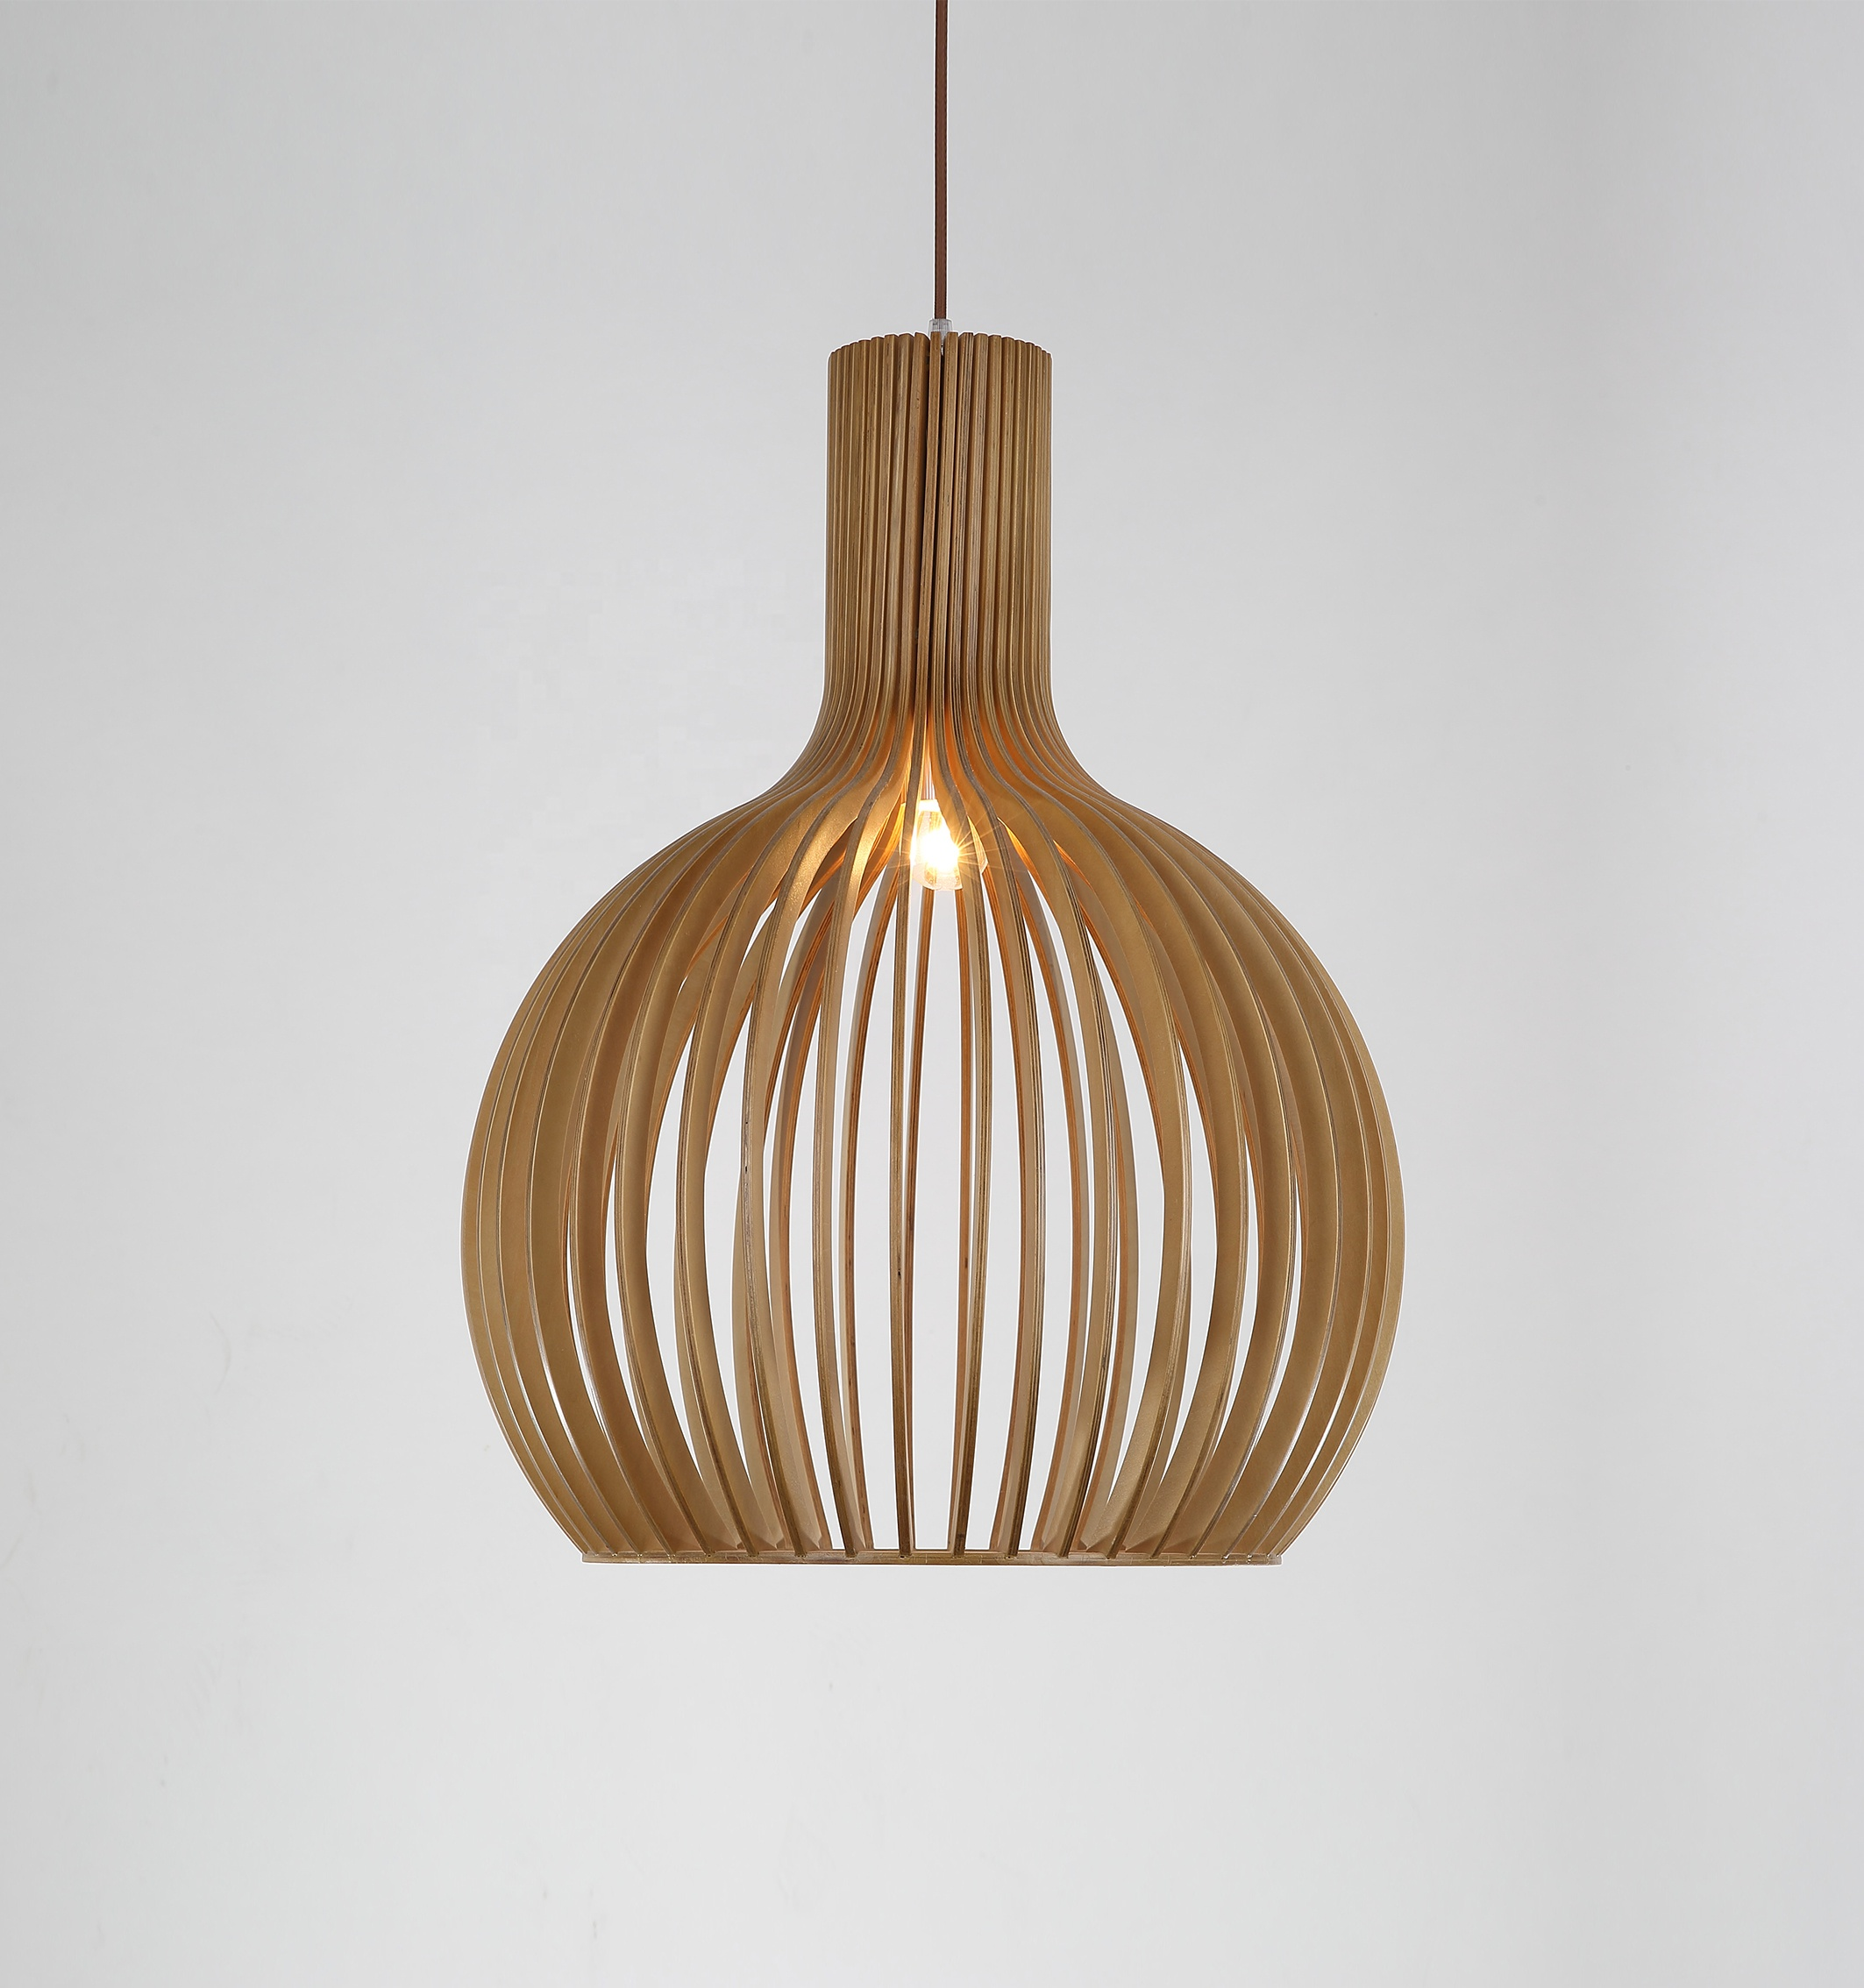 Handmade wooden pendant lamp.